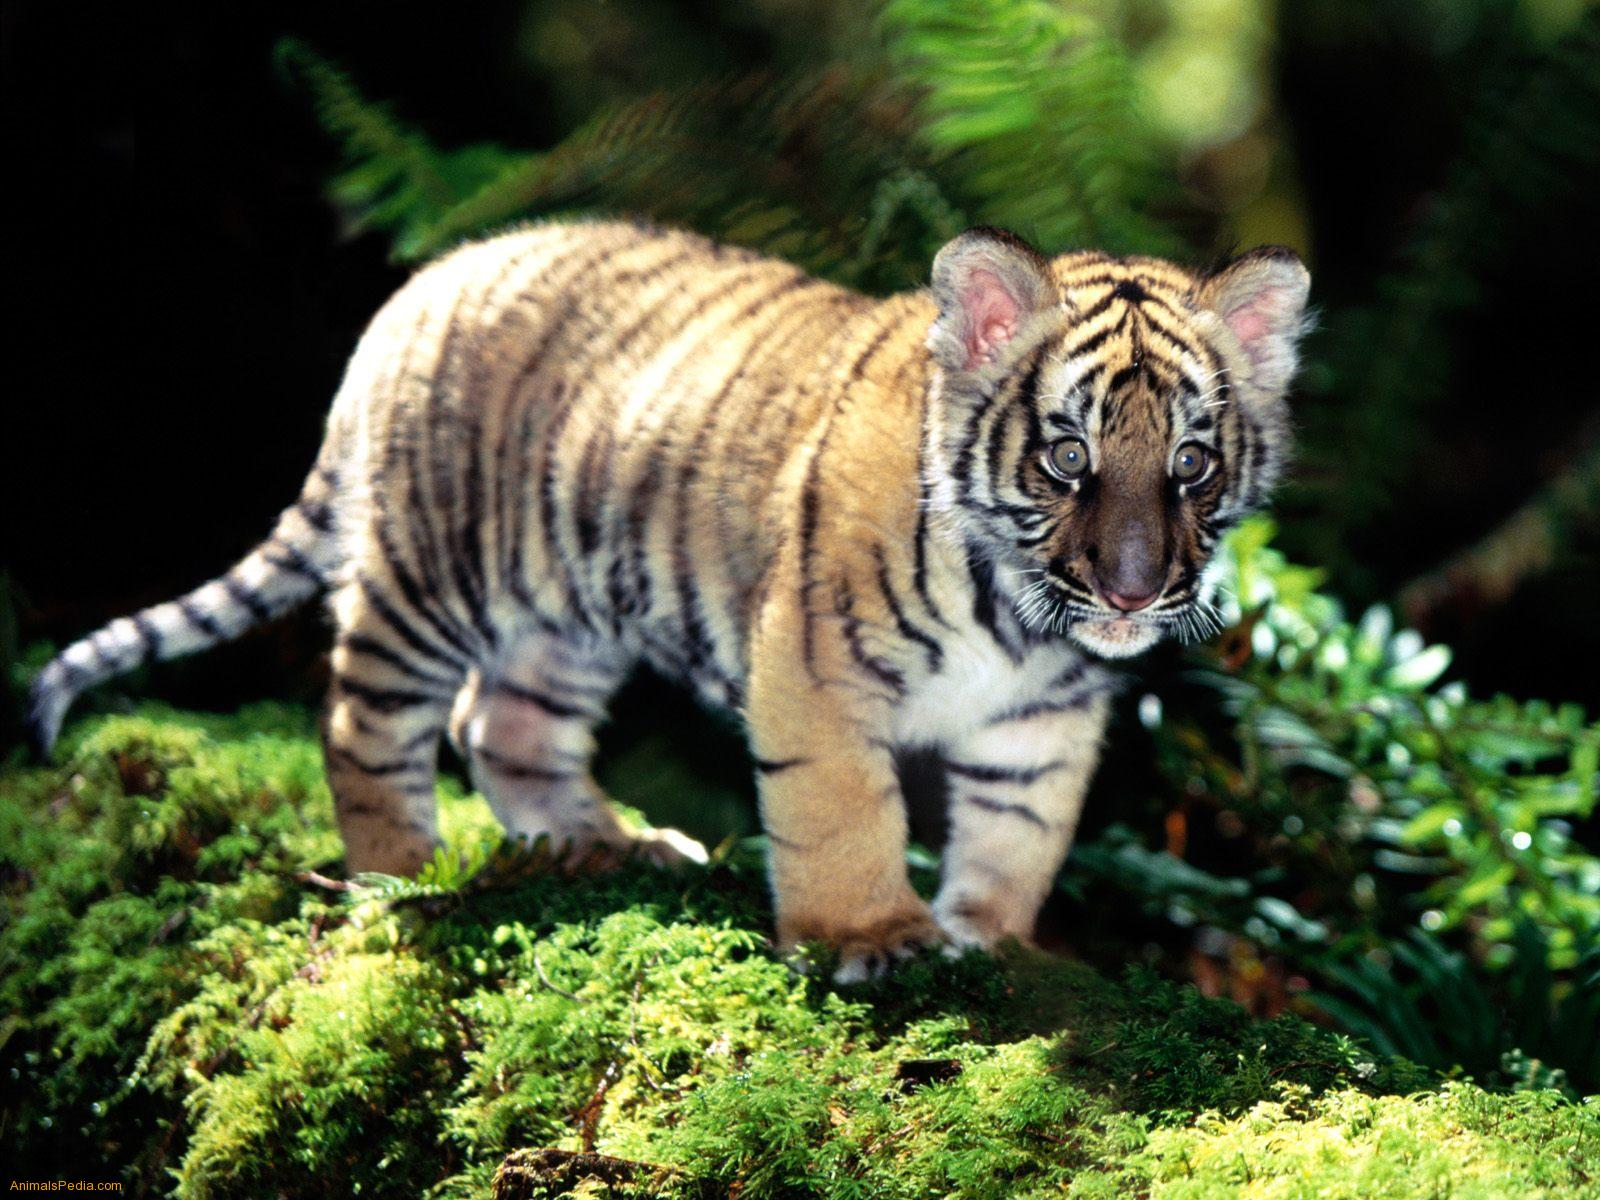 encyclopaedia of babies of beautiful wild animals: tiger cubs